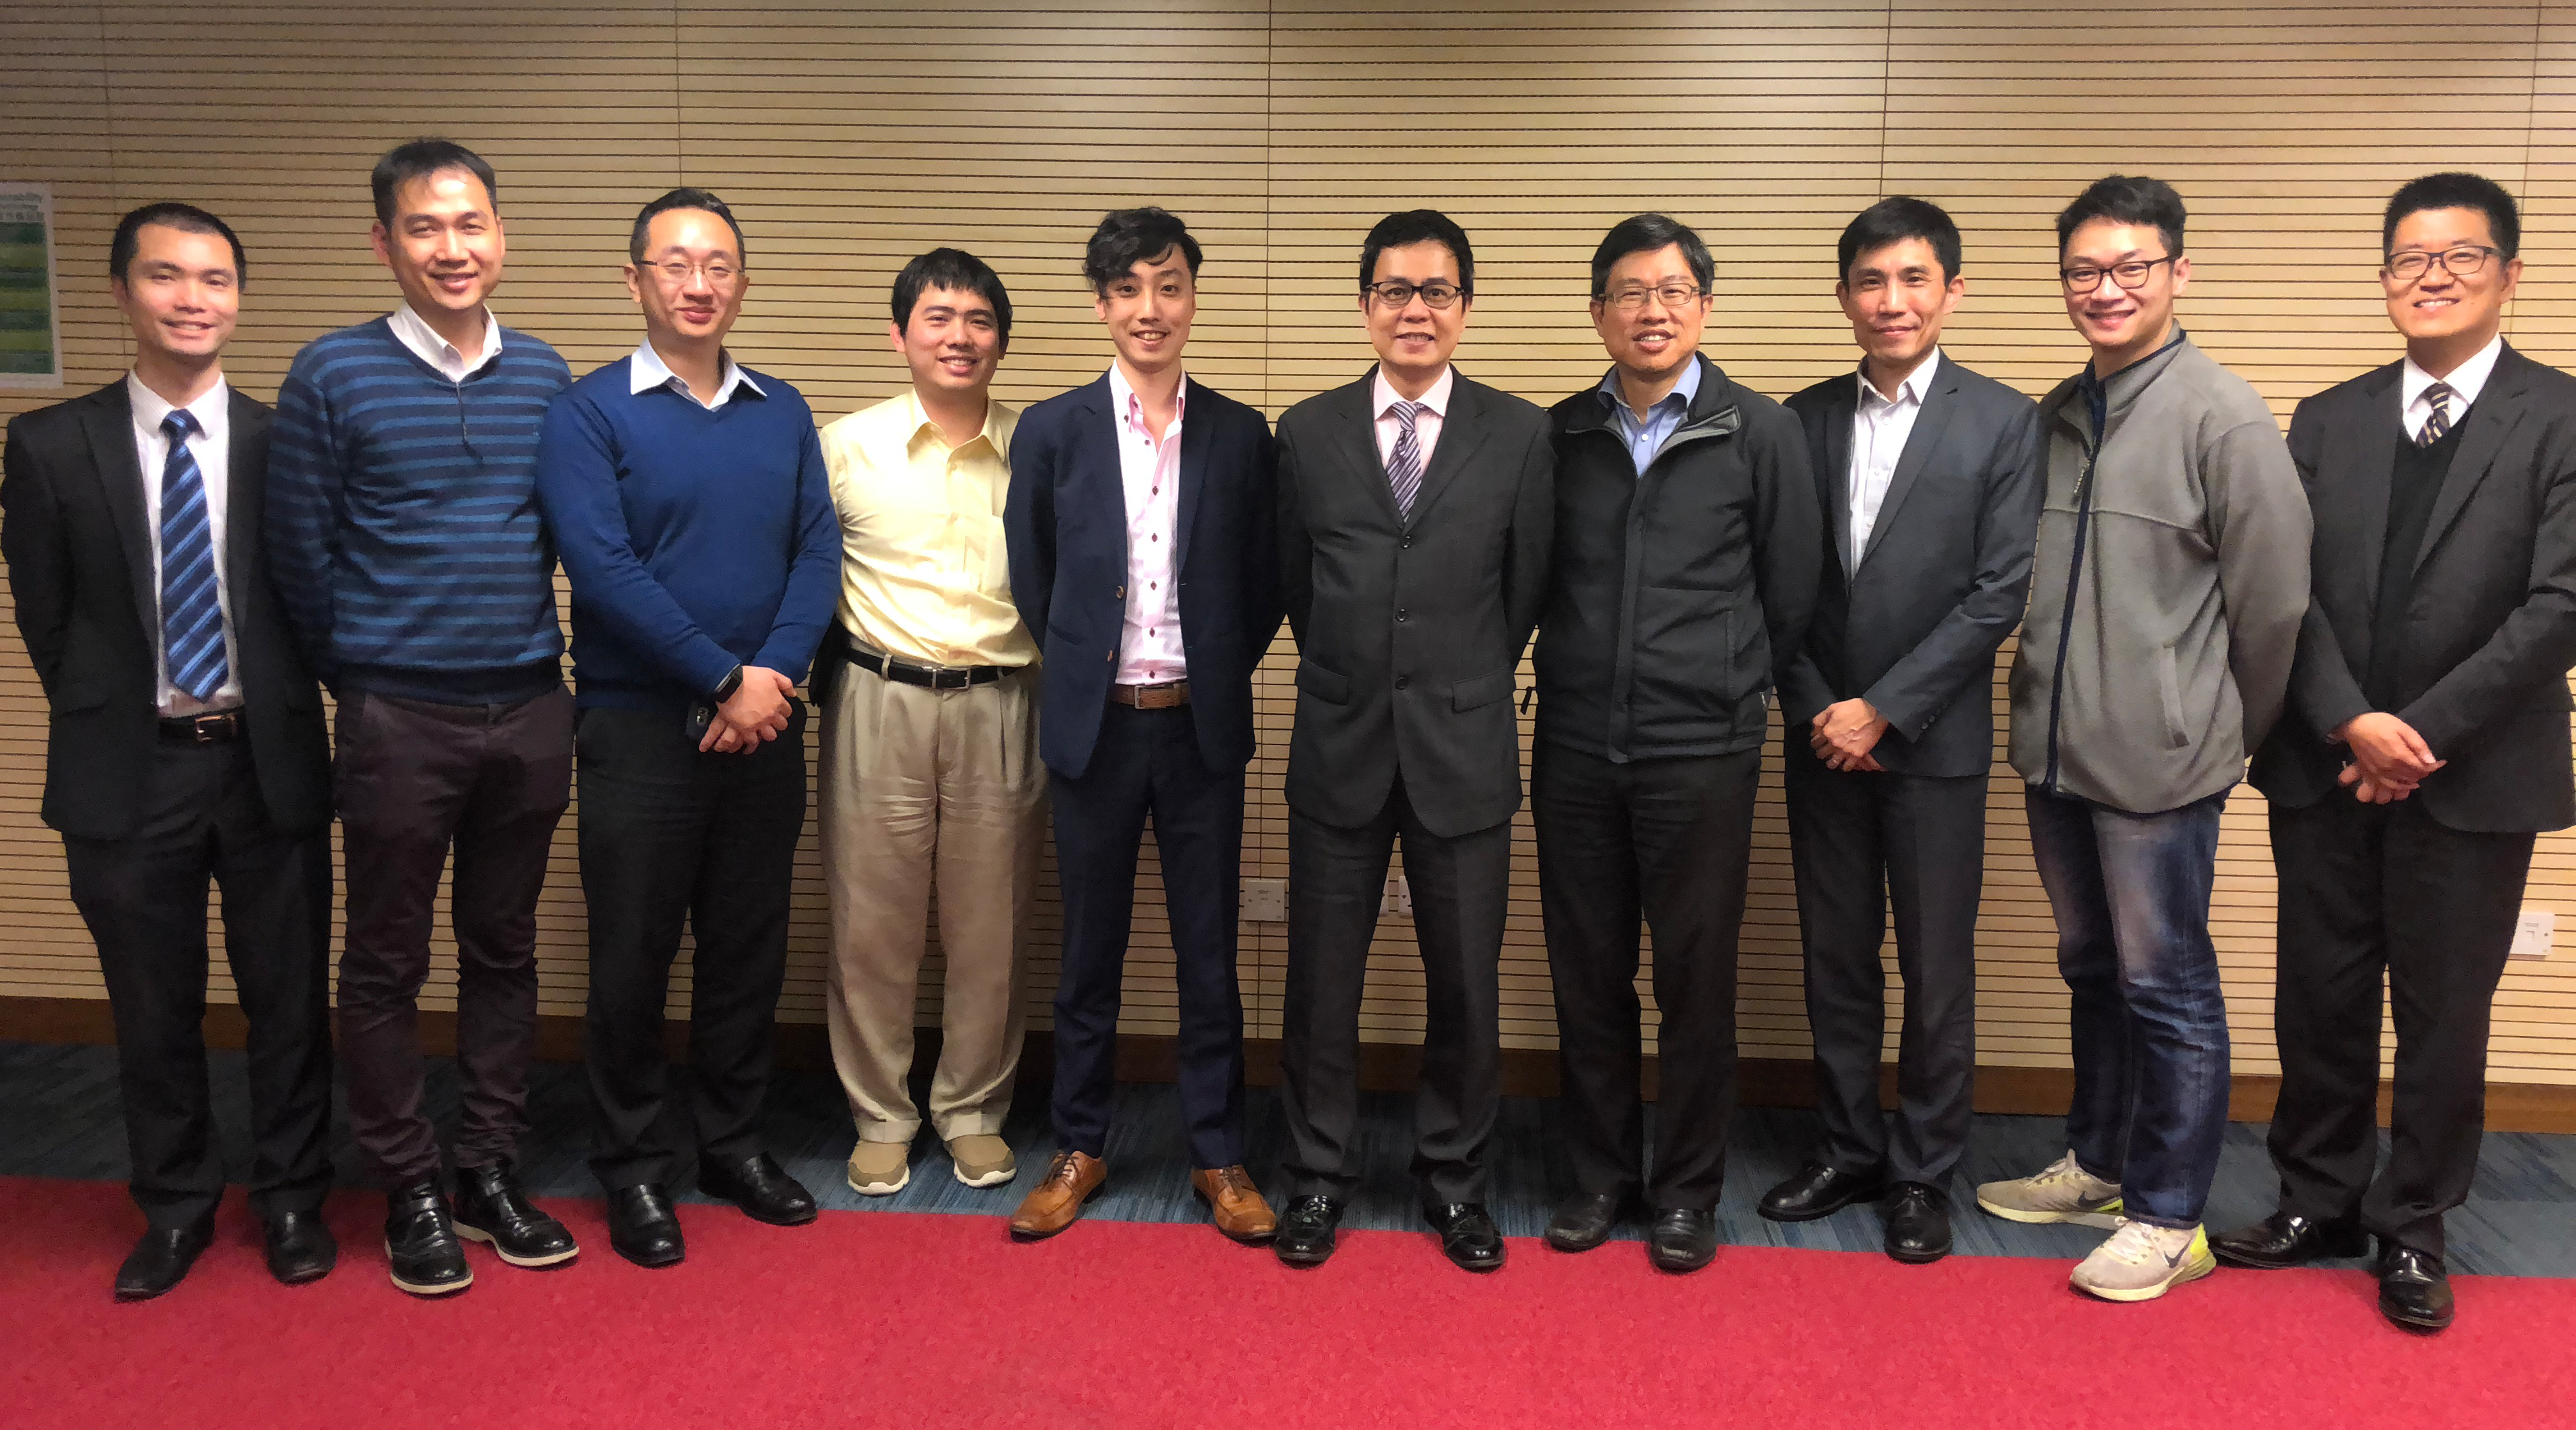 CSA HKM Councilors 2018